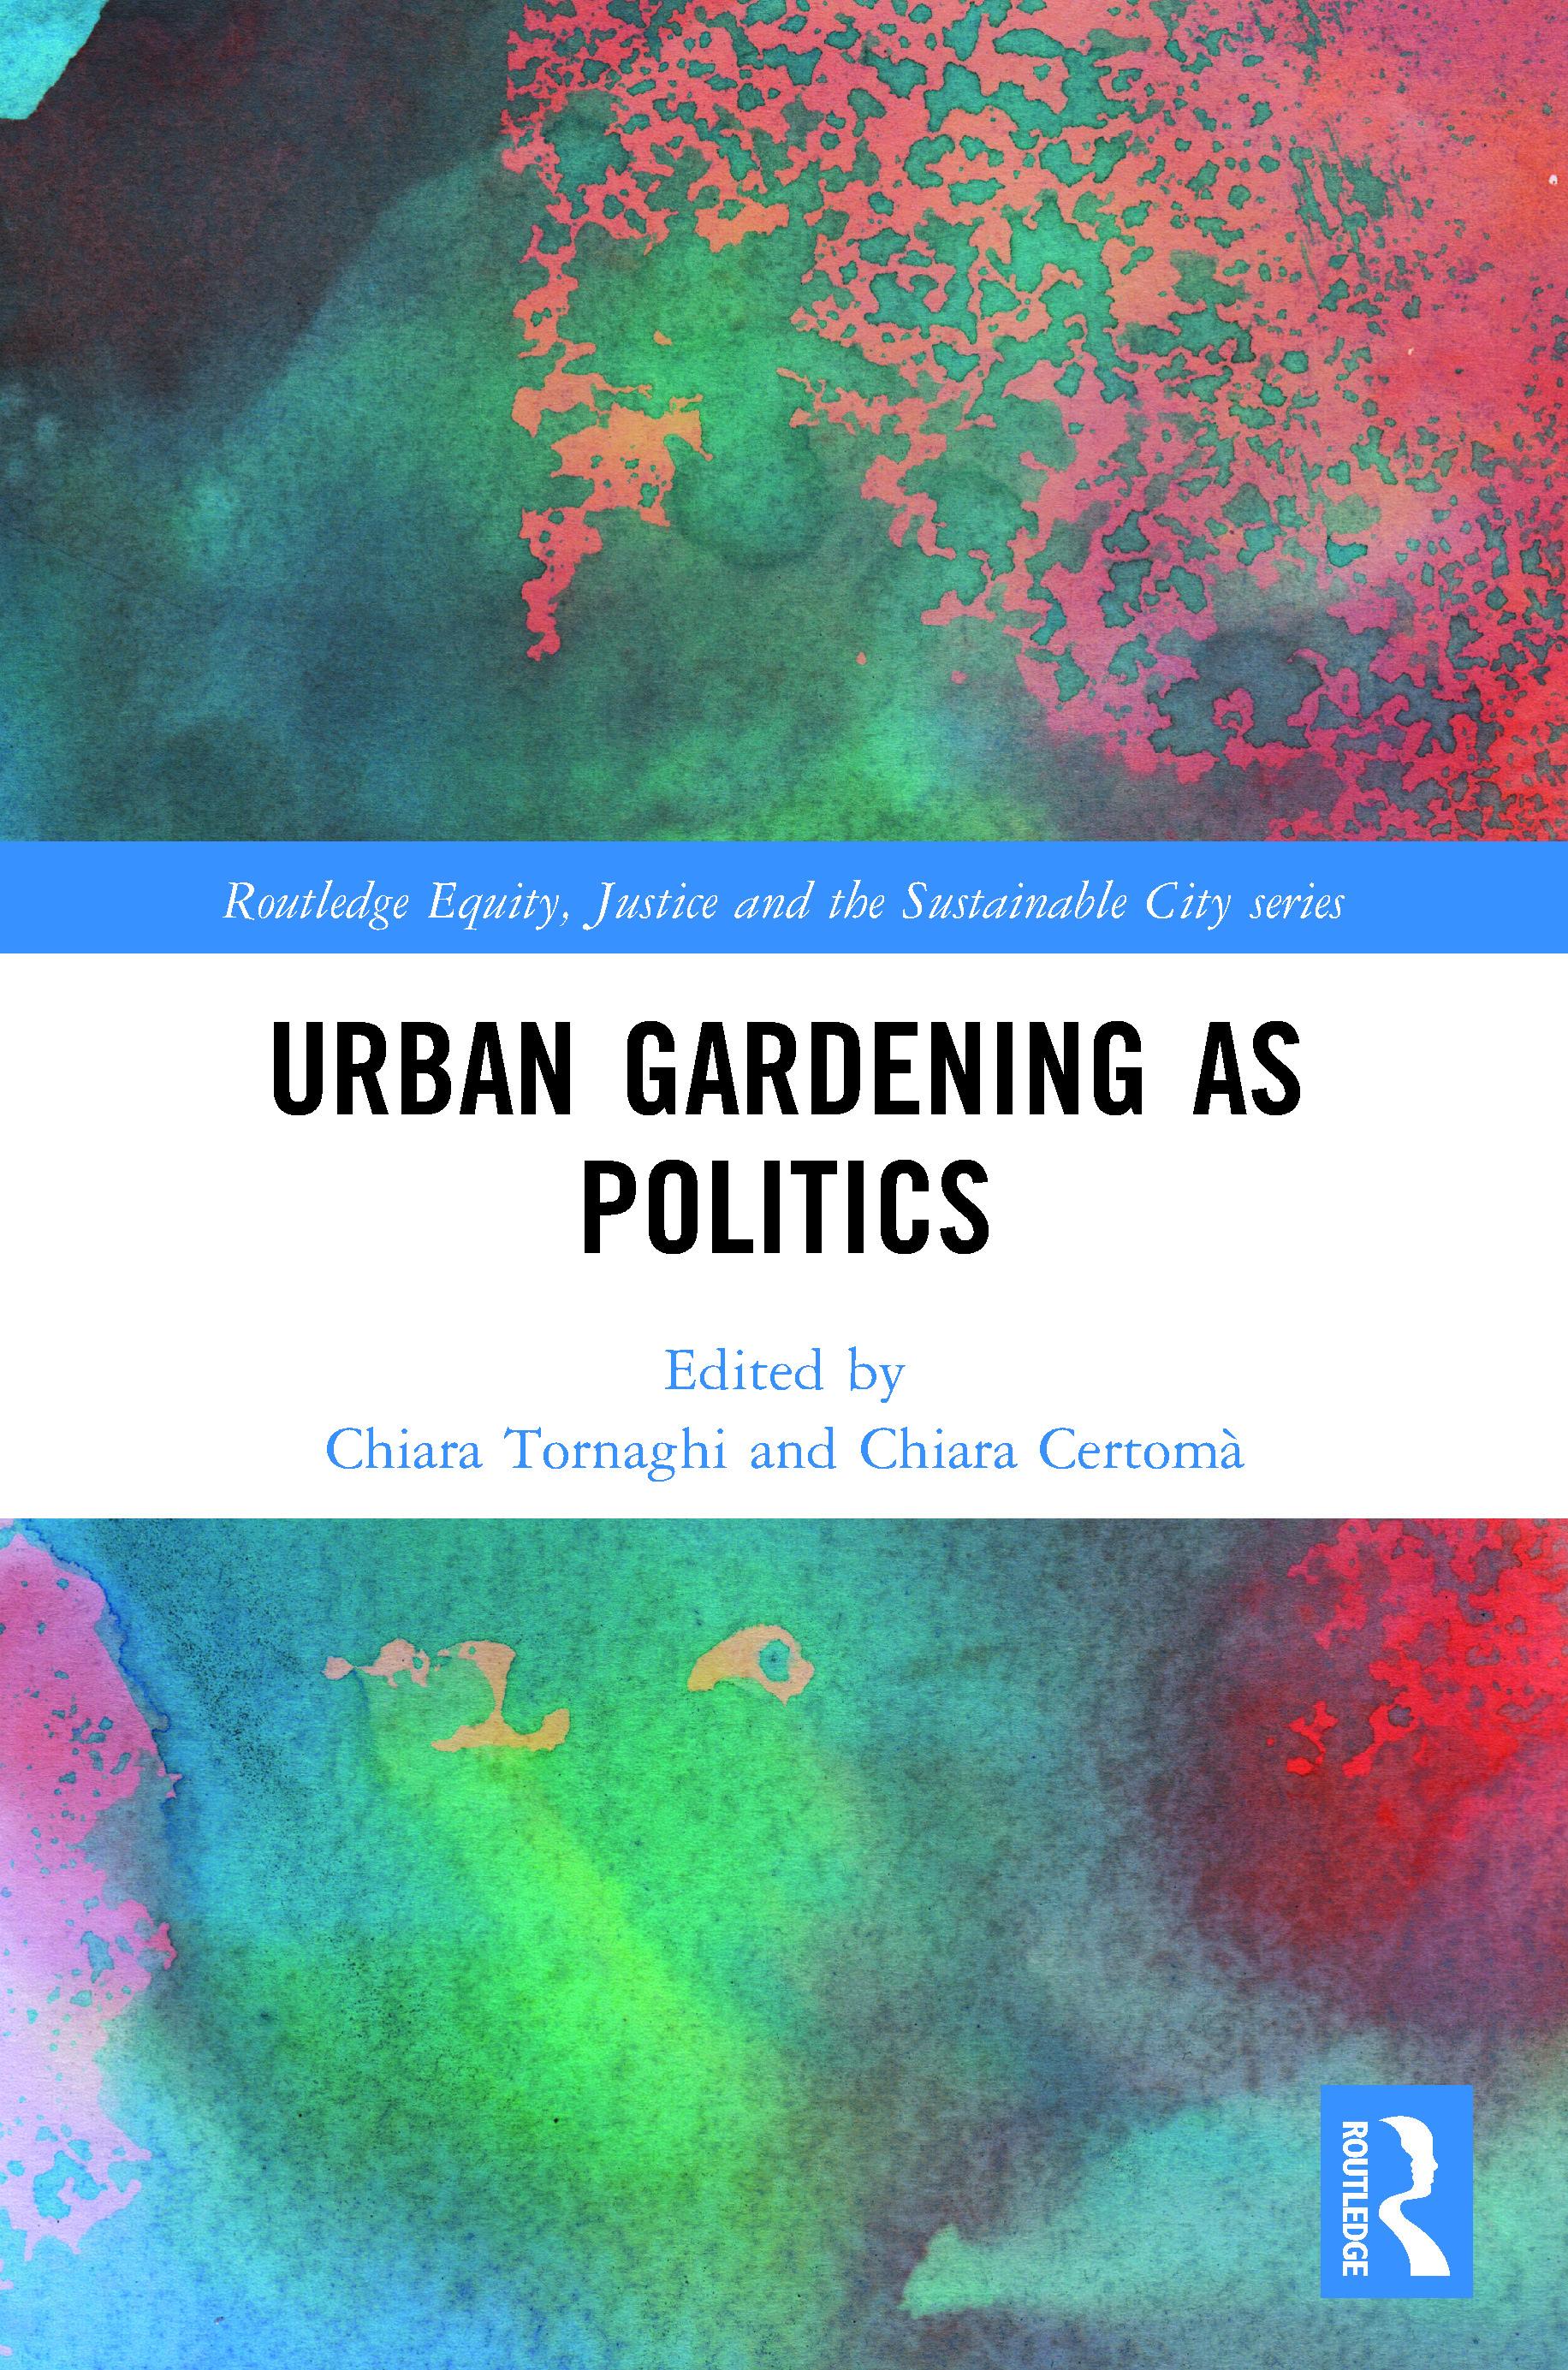 Urban Gardening as Politics